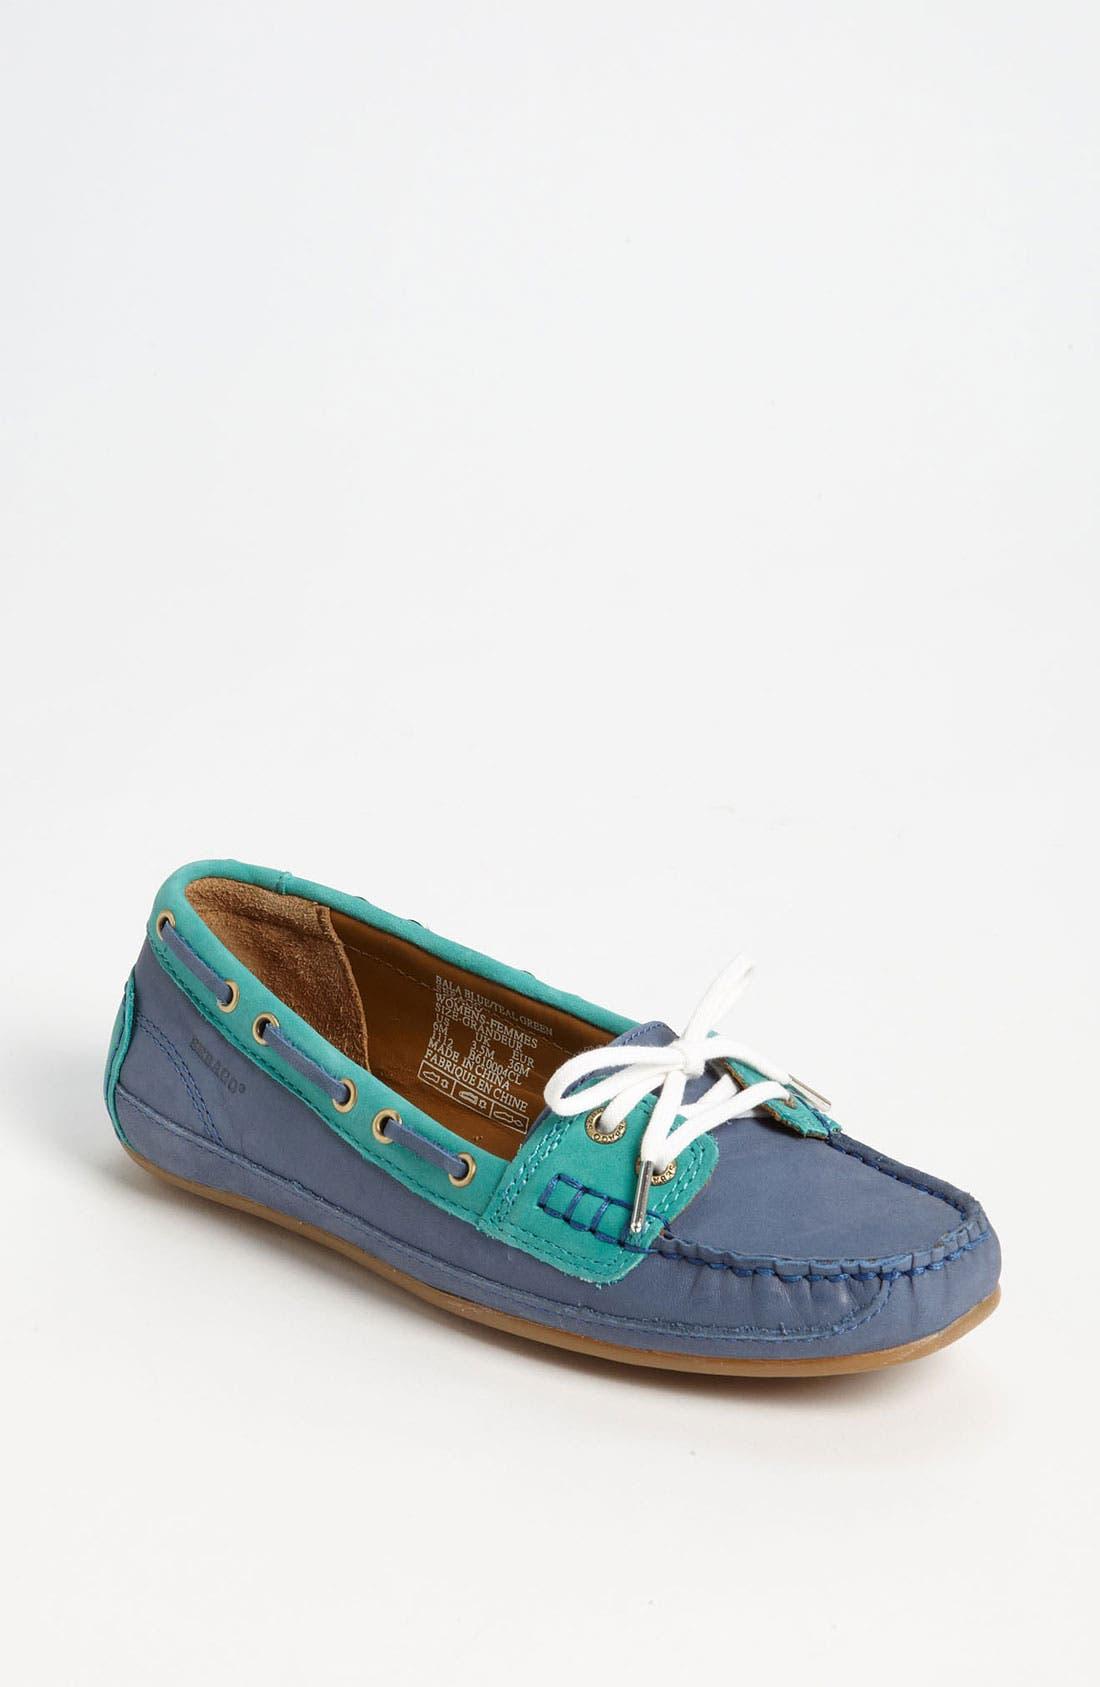 Alternate Image 1 Selected - Sebago 'Bala' Boat Shoe